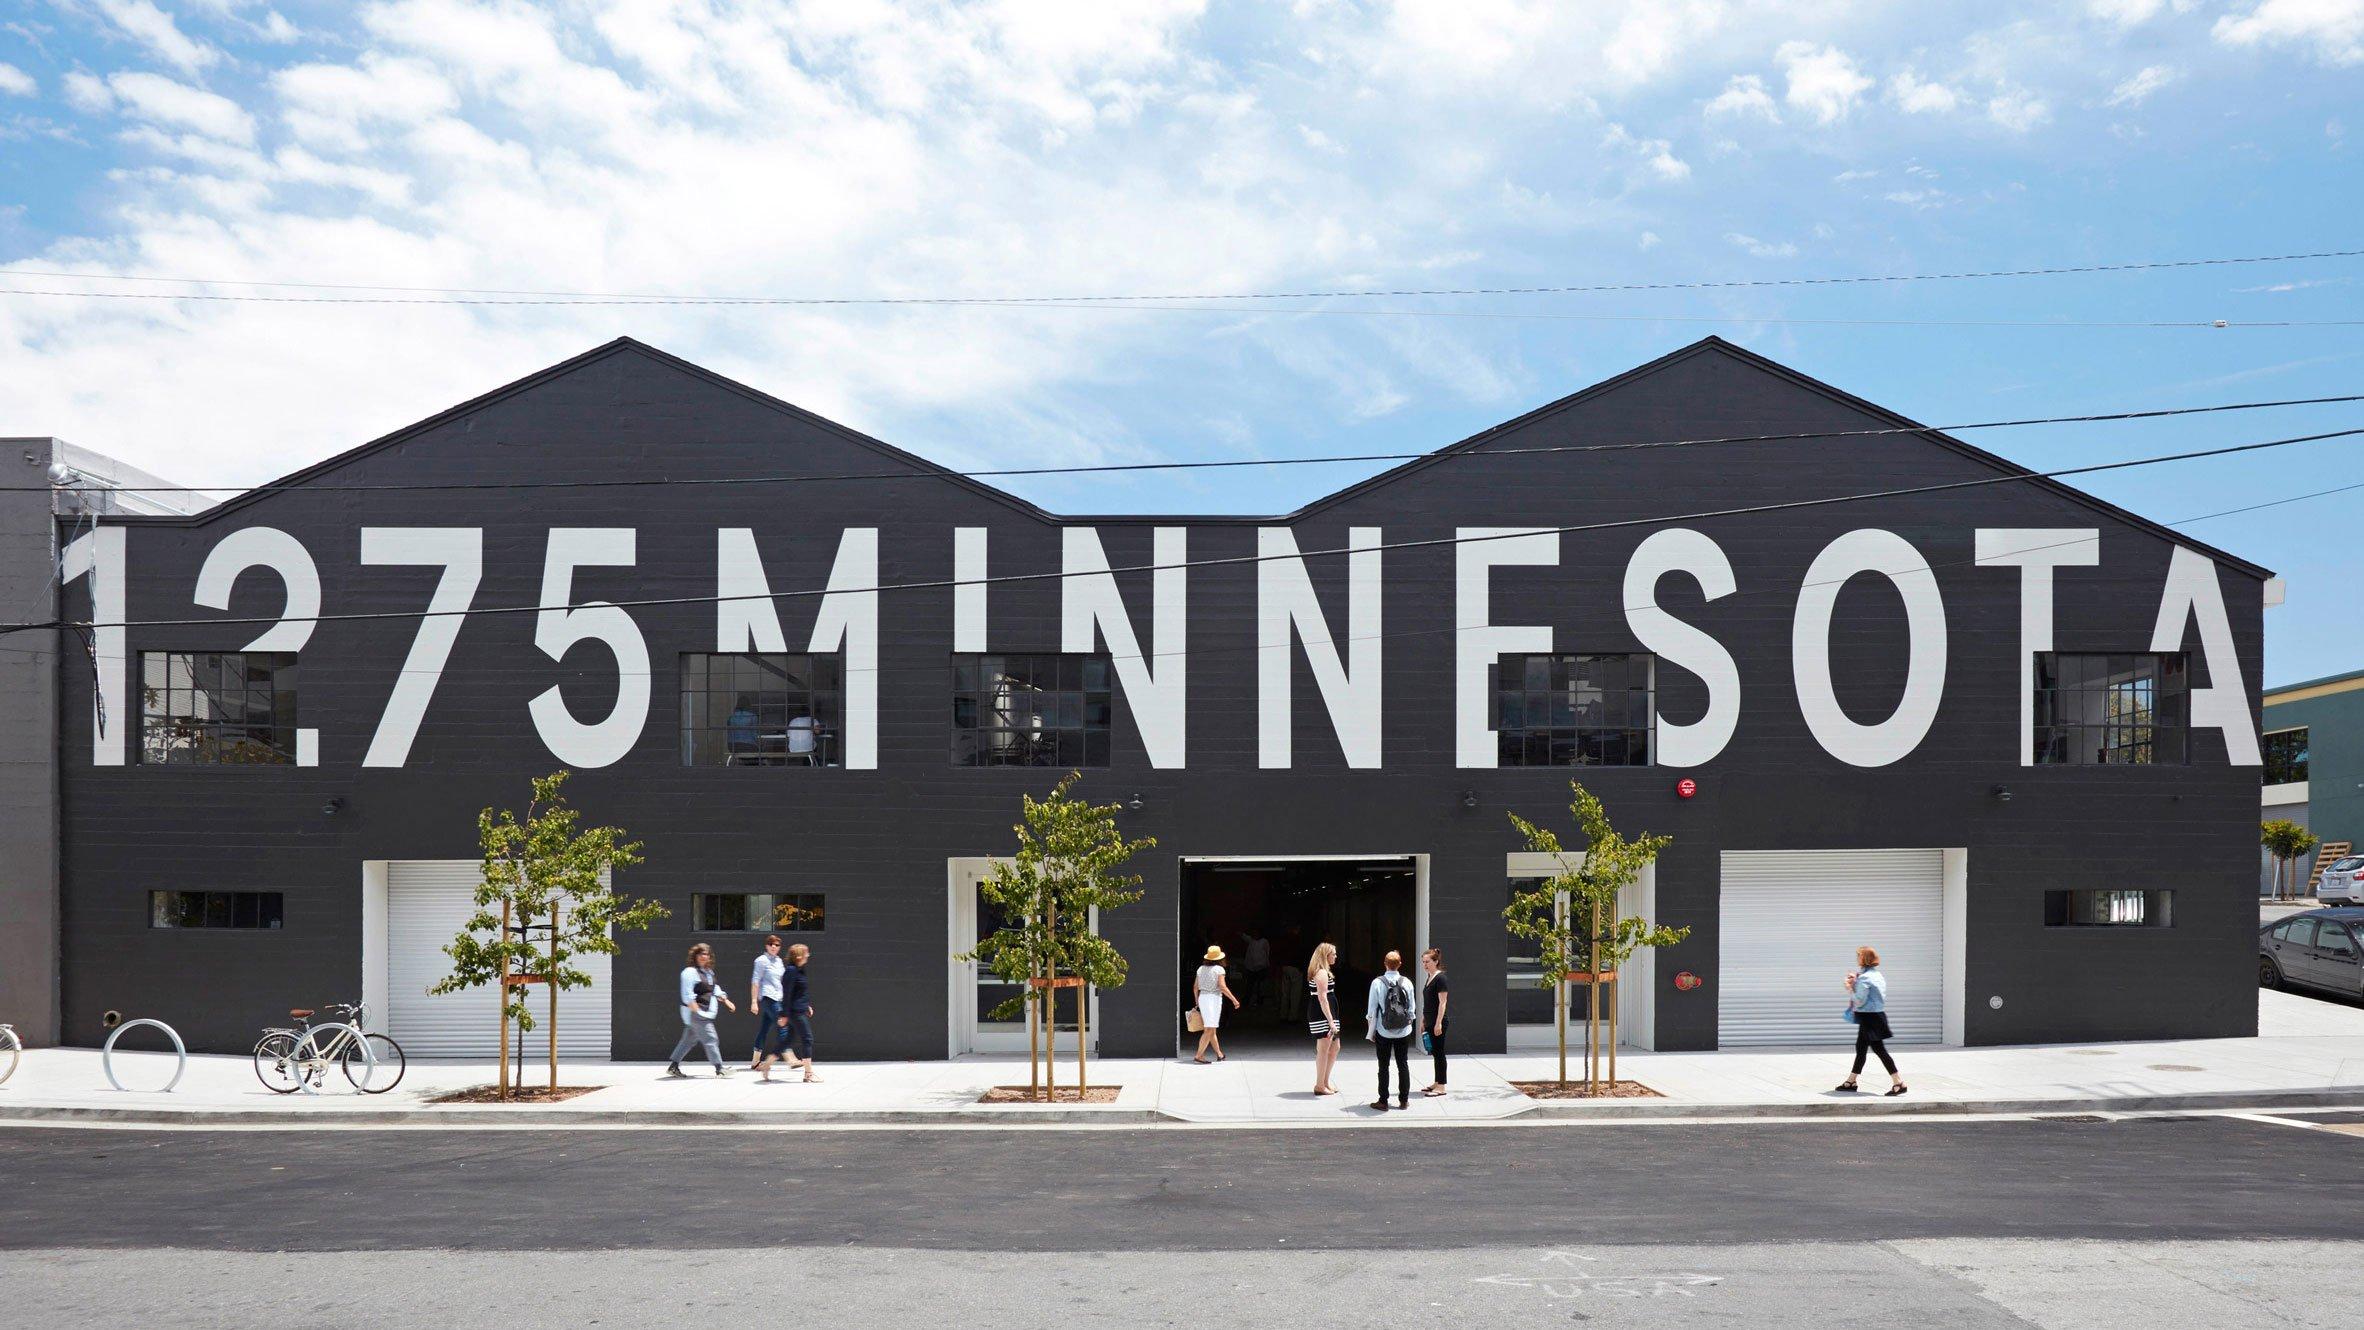 1275 Minnesota Street by Jensen Architects